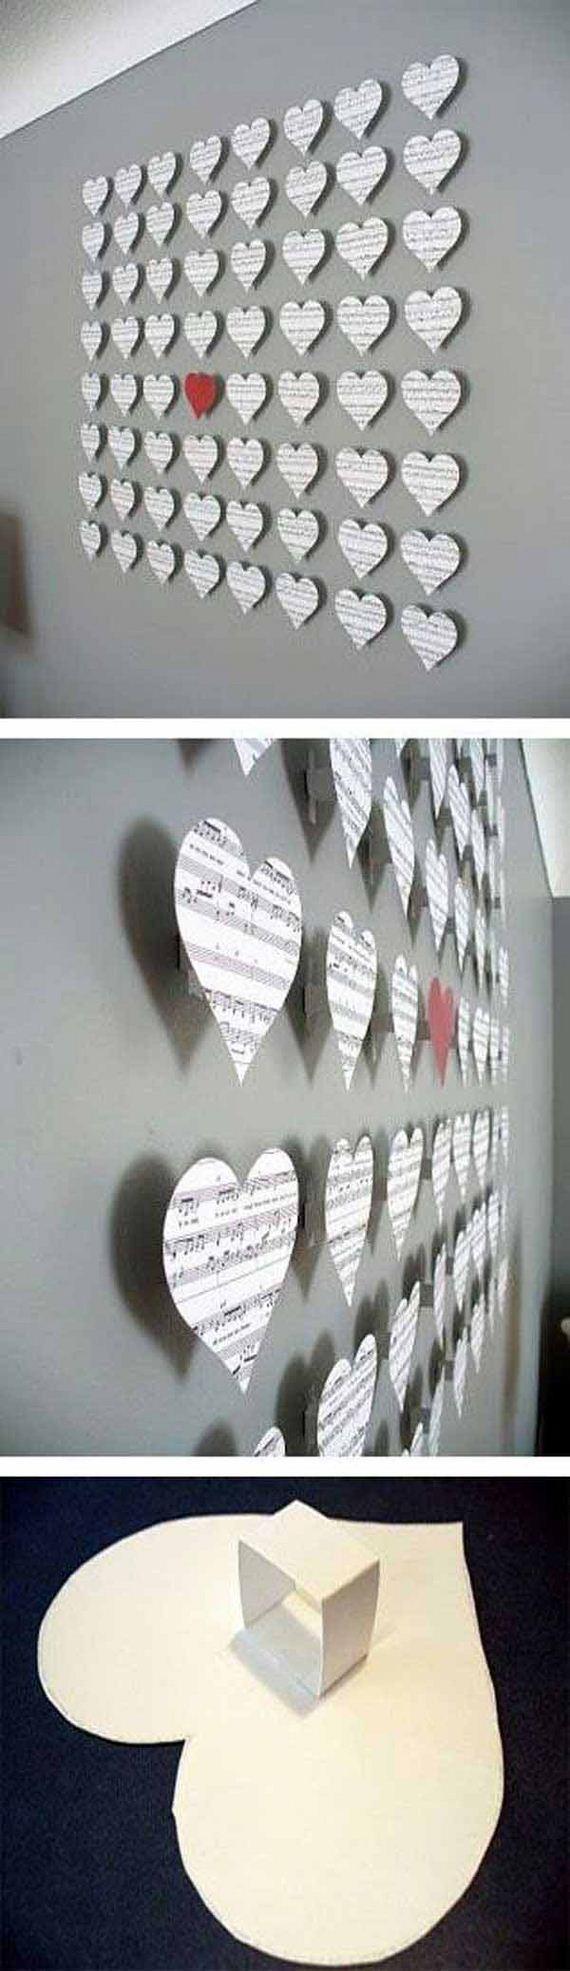 06-diy-wall-decor-woohome